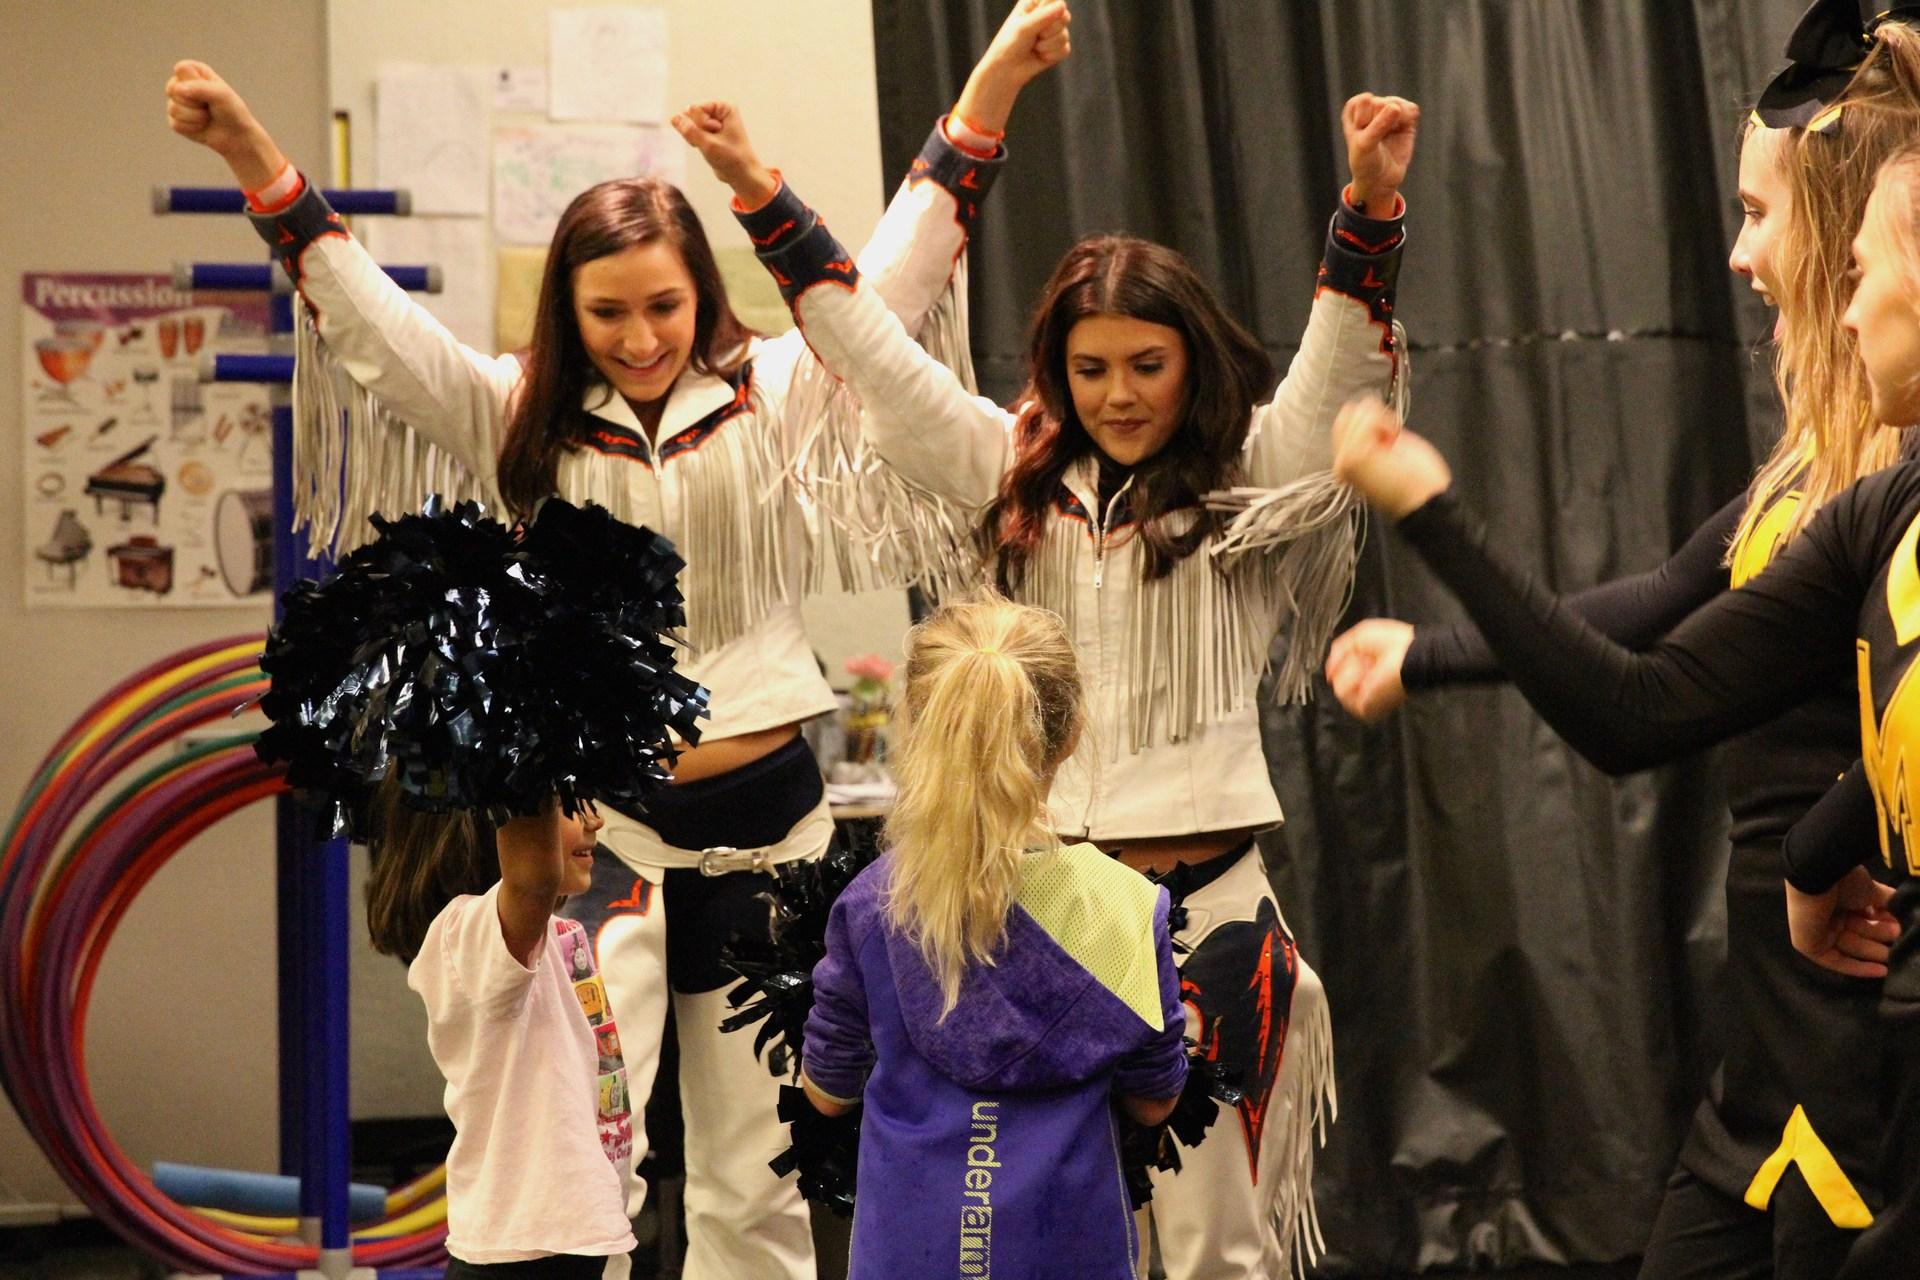 Broncos cheerleaders show little girls a cheer